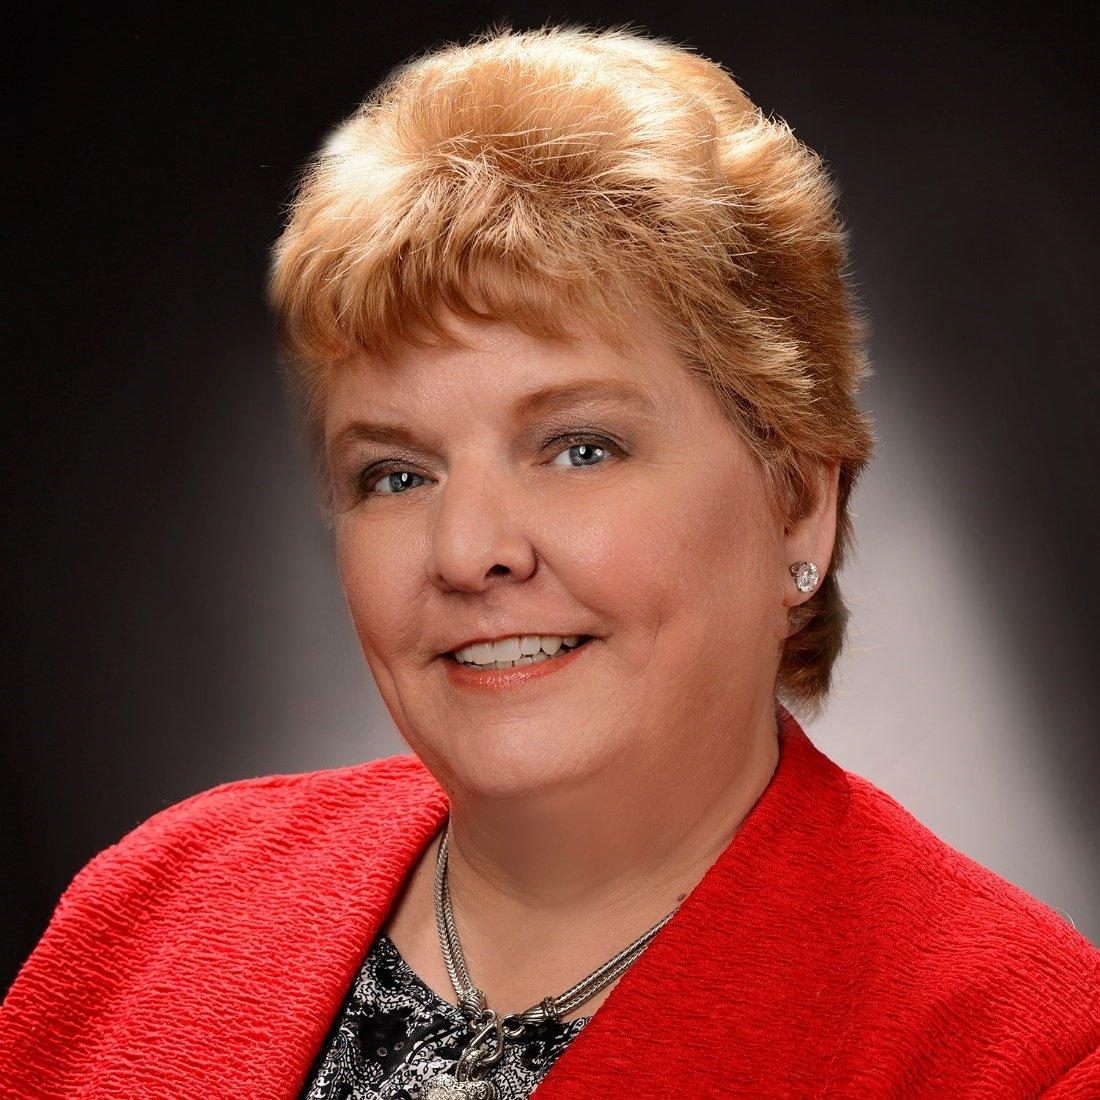 Lori Ann Mertens